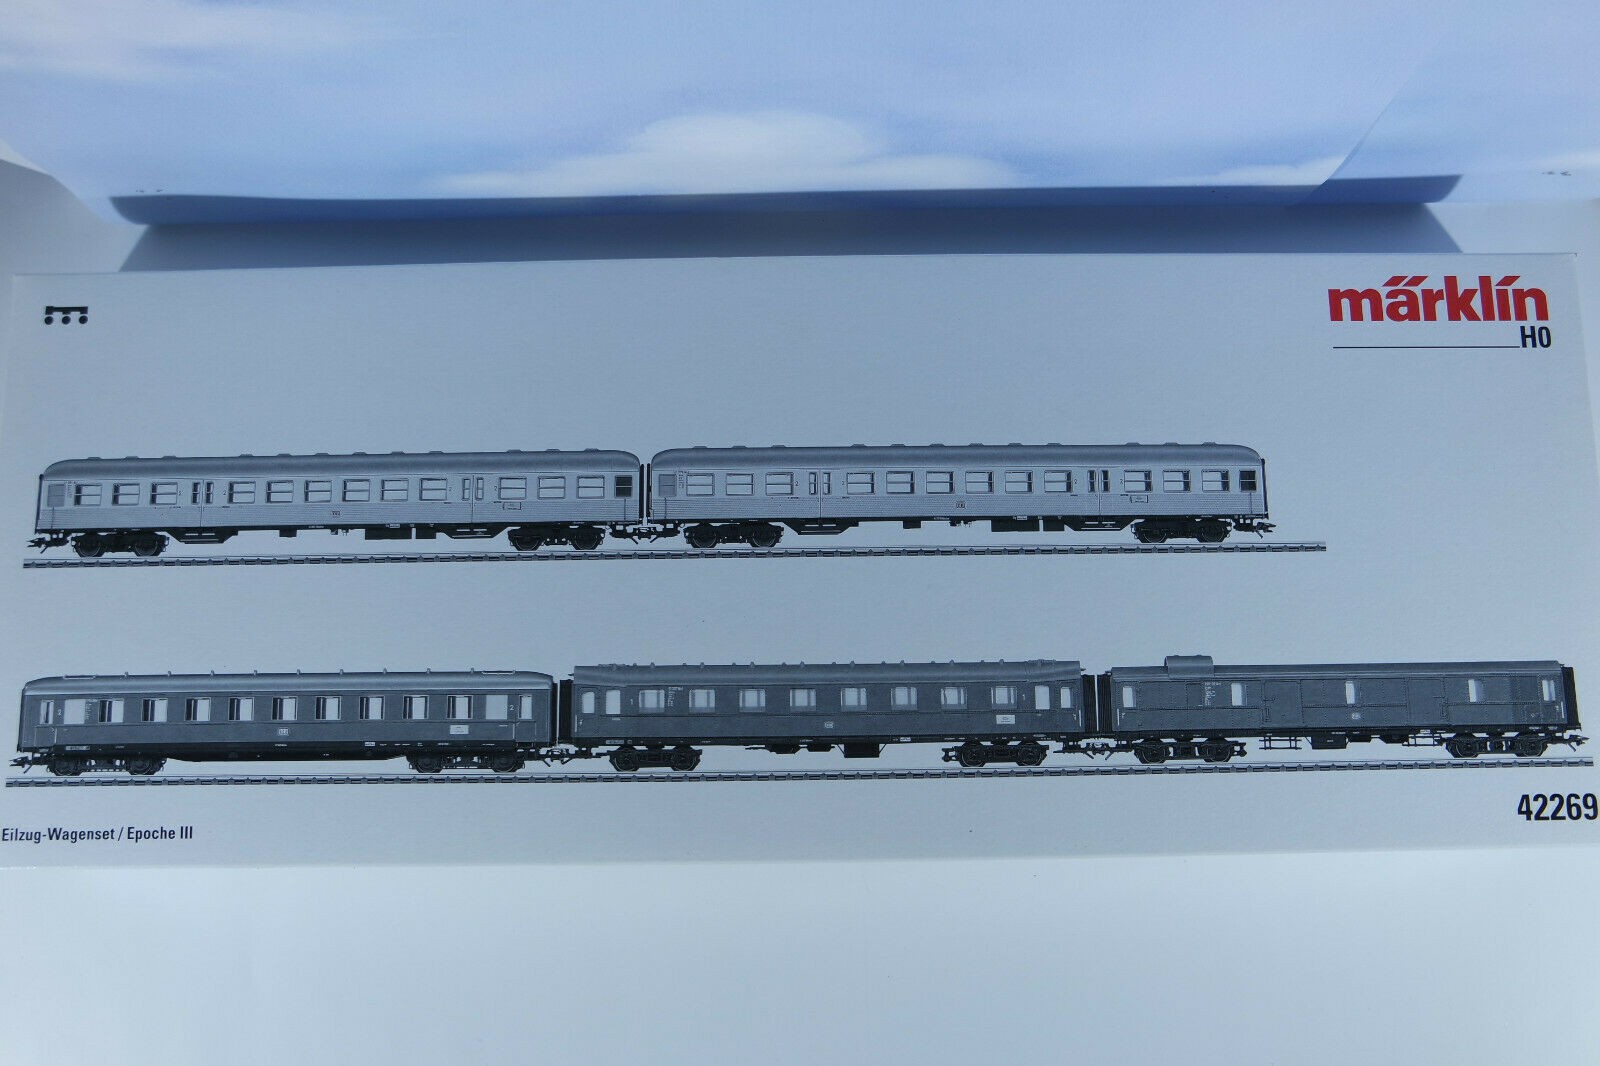 Märklin 42269 wagenset vestuarios, sin usar, Neuw, utilizada, embalaje original